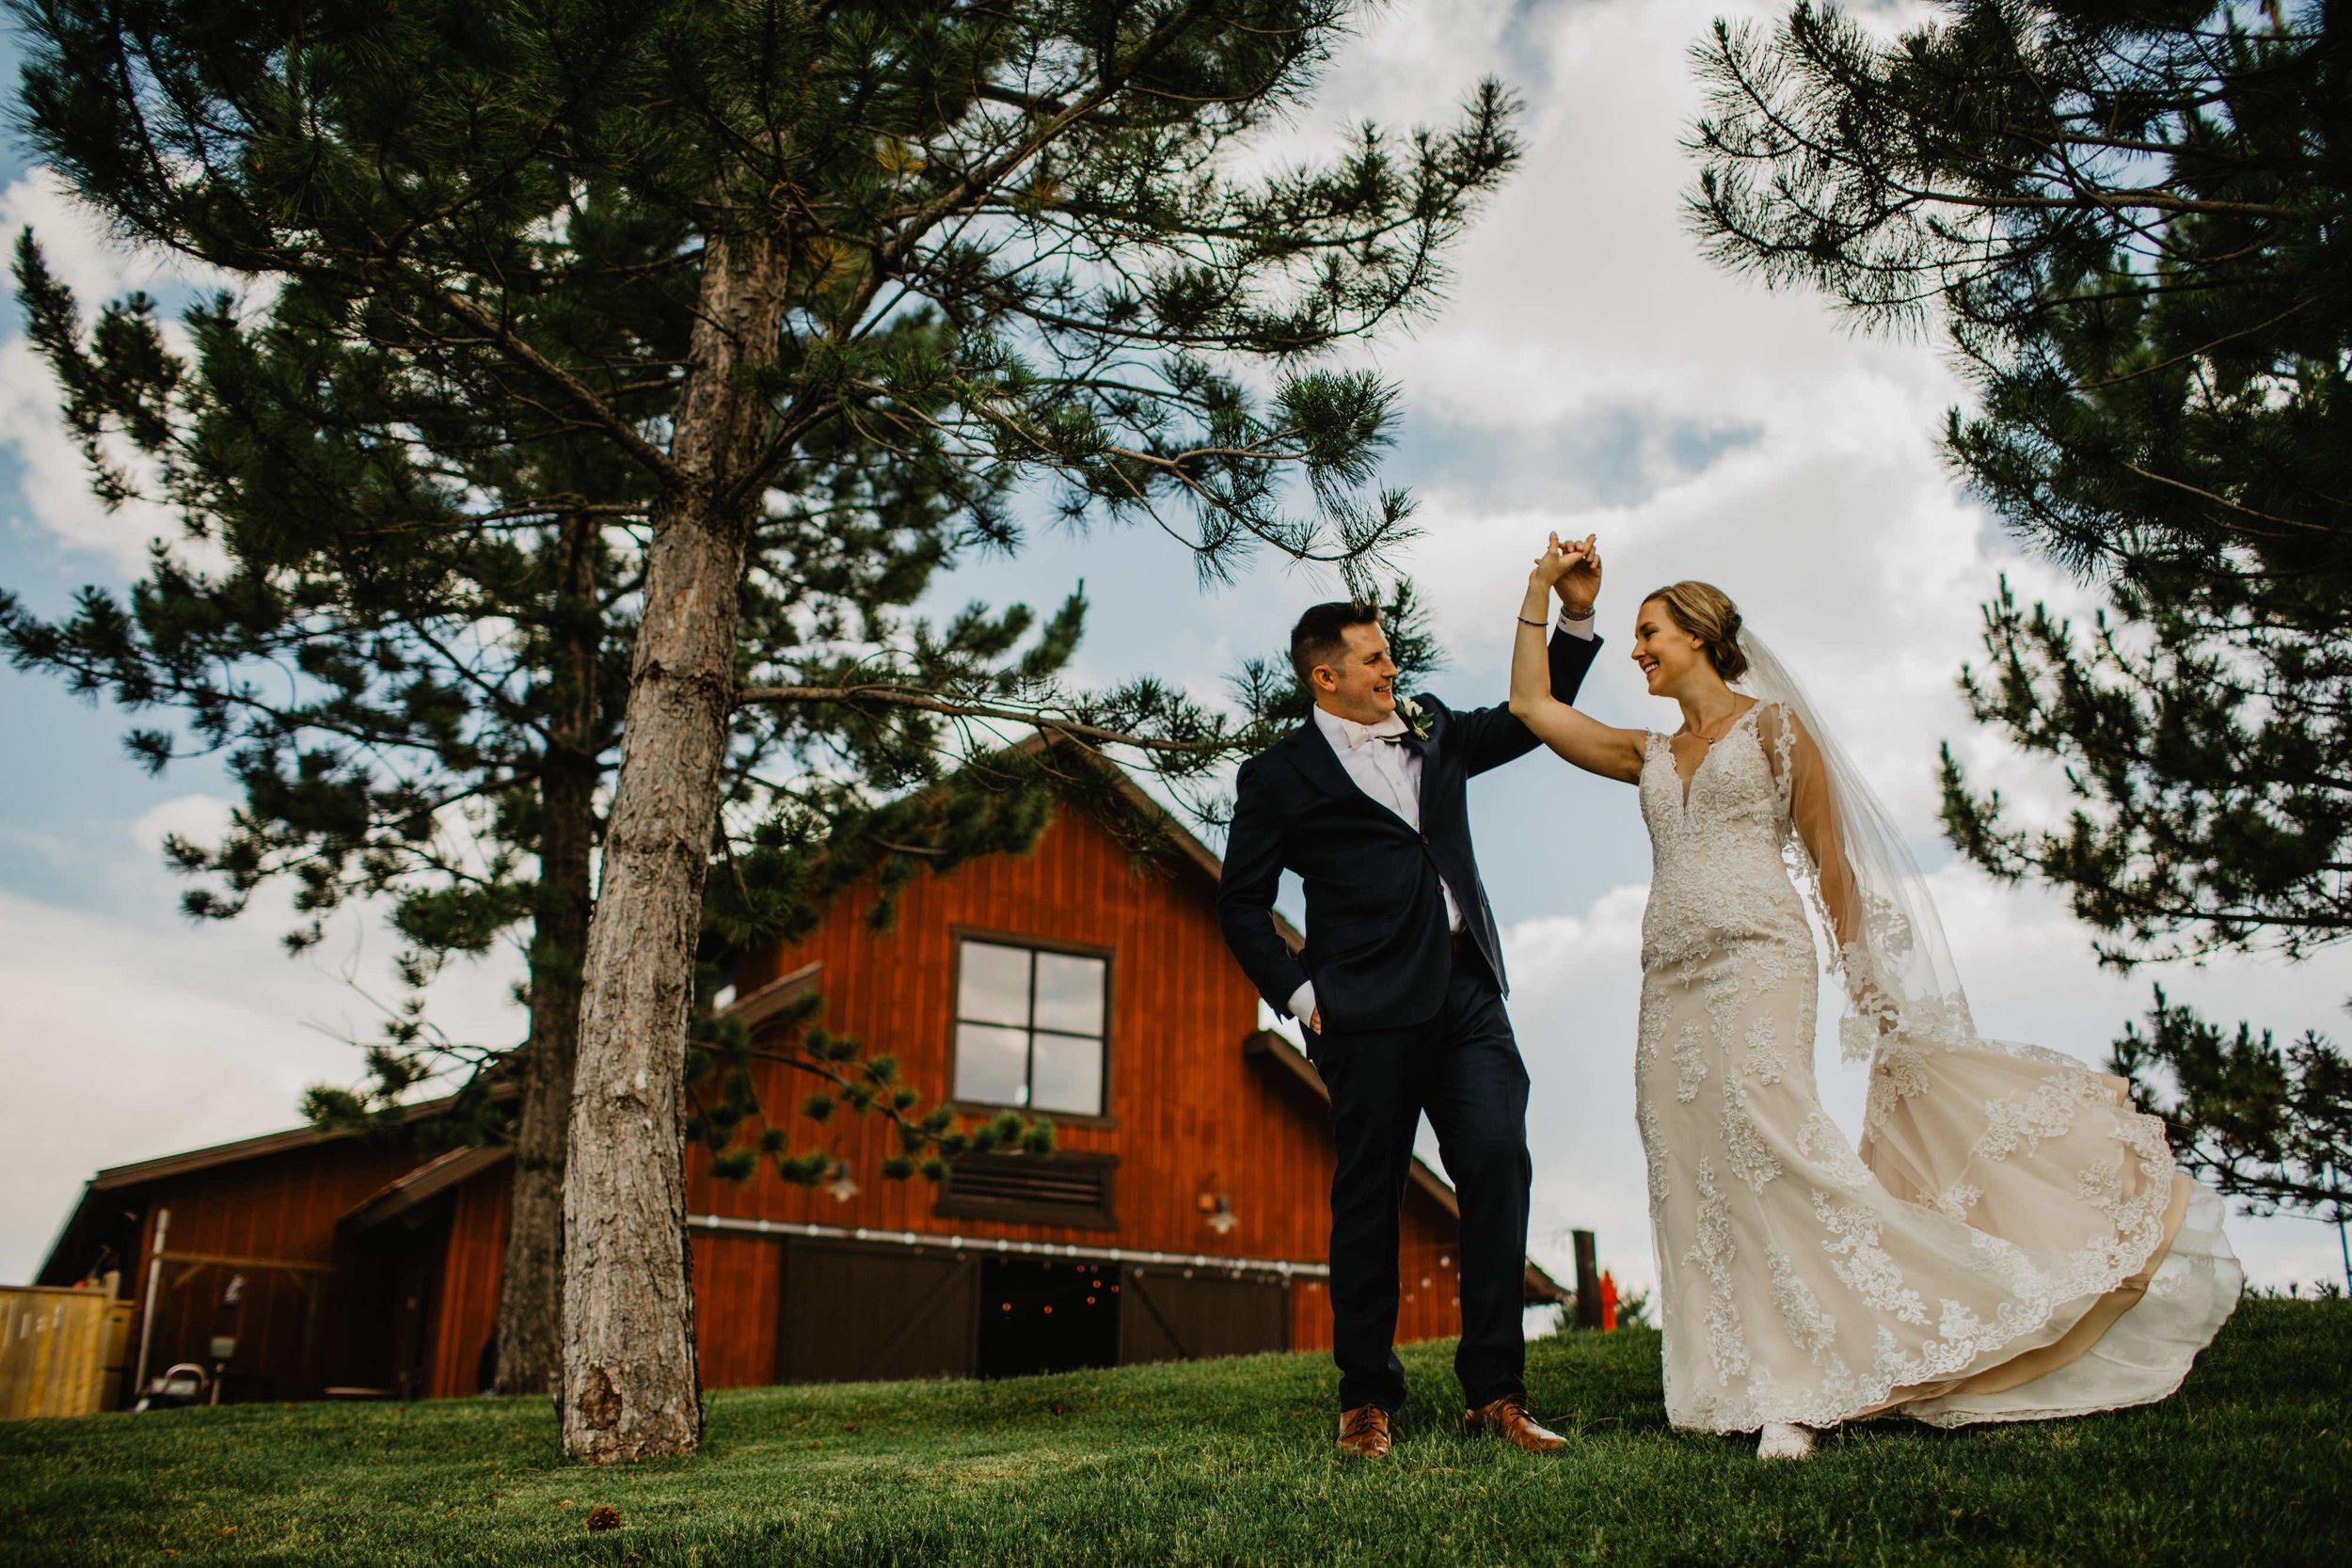 Kisa Conrad Favorites-0021-colorado-wedding-photographer-denver-springs-vail.jpeg